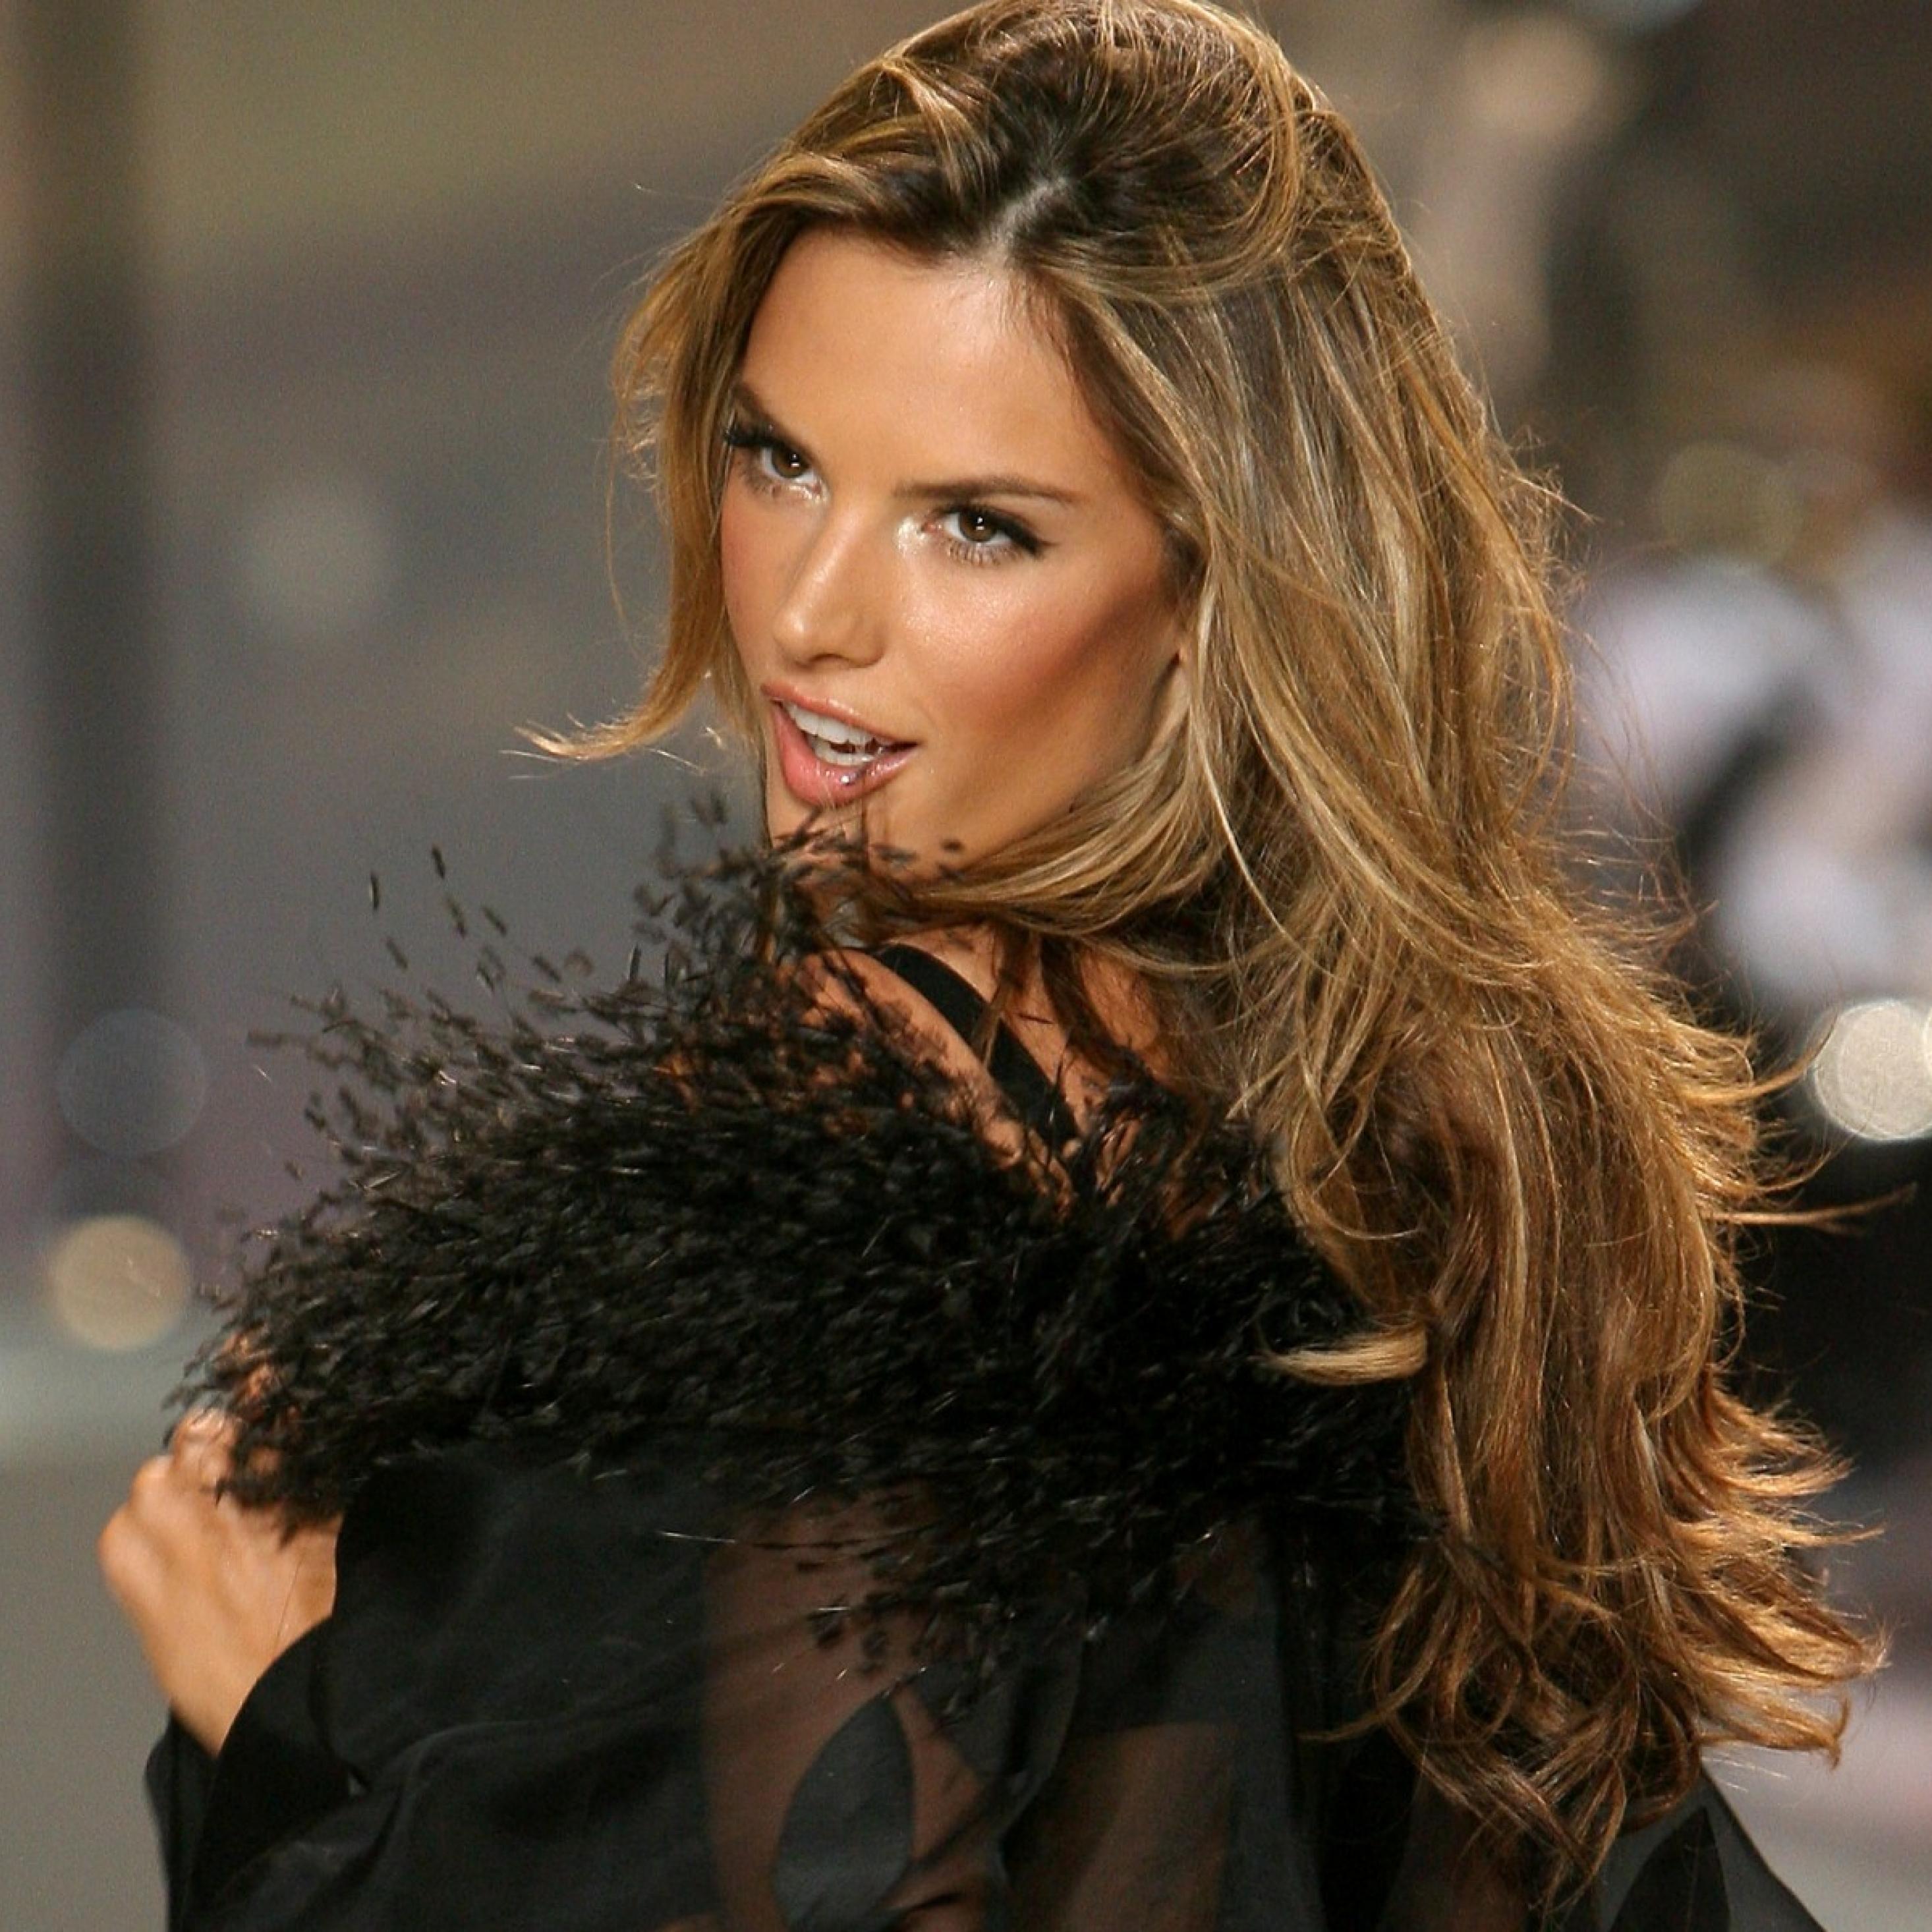 f5b8c280fc 2932x2932 Alessandra Ambrosio Victoria S Secret Fashion Show Ipad ...